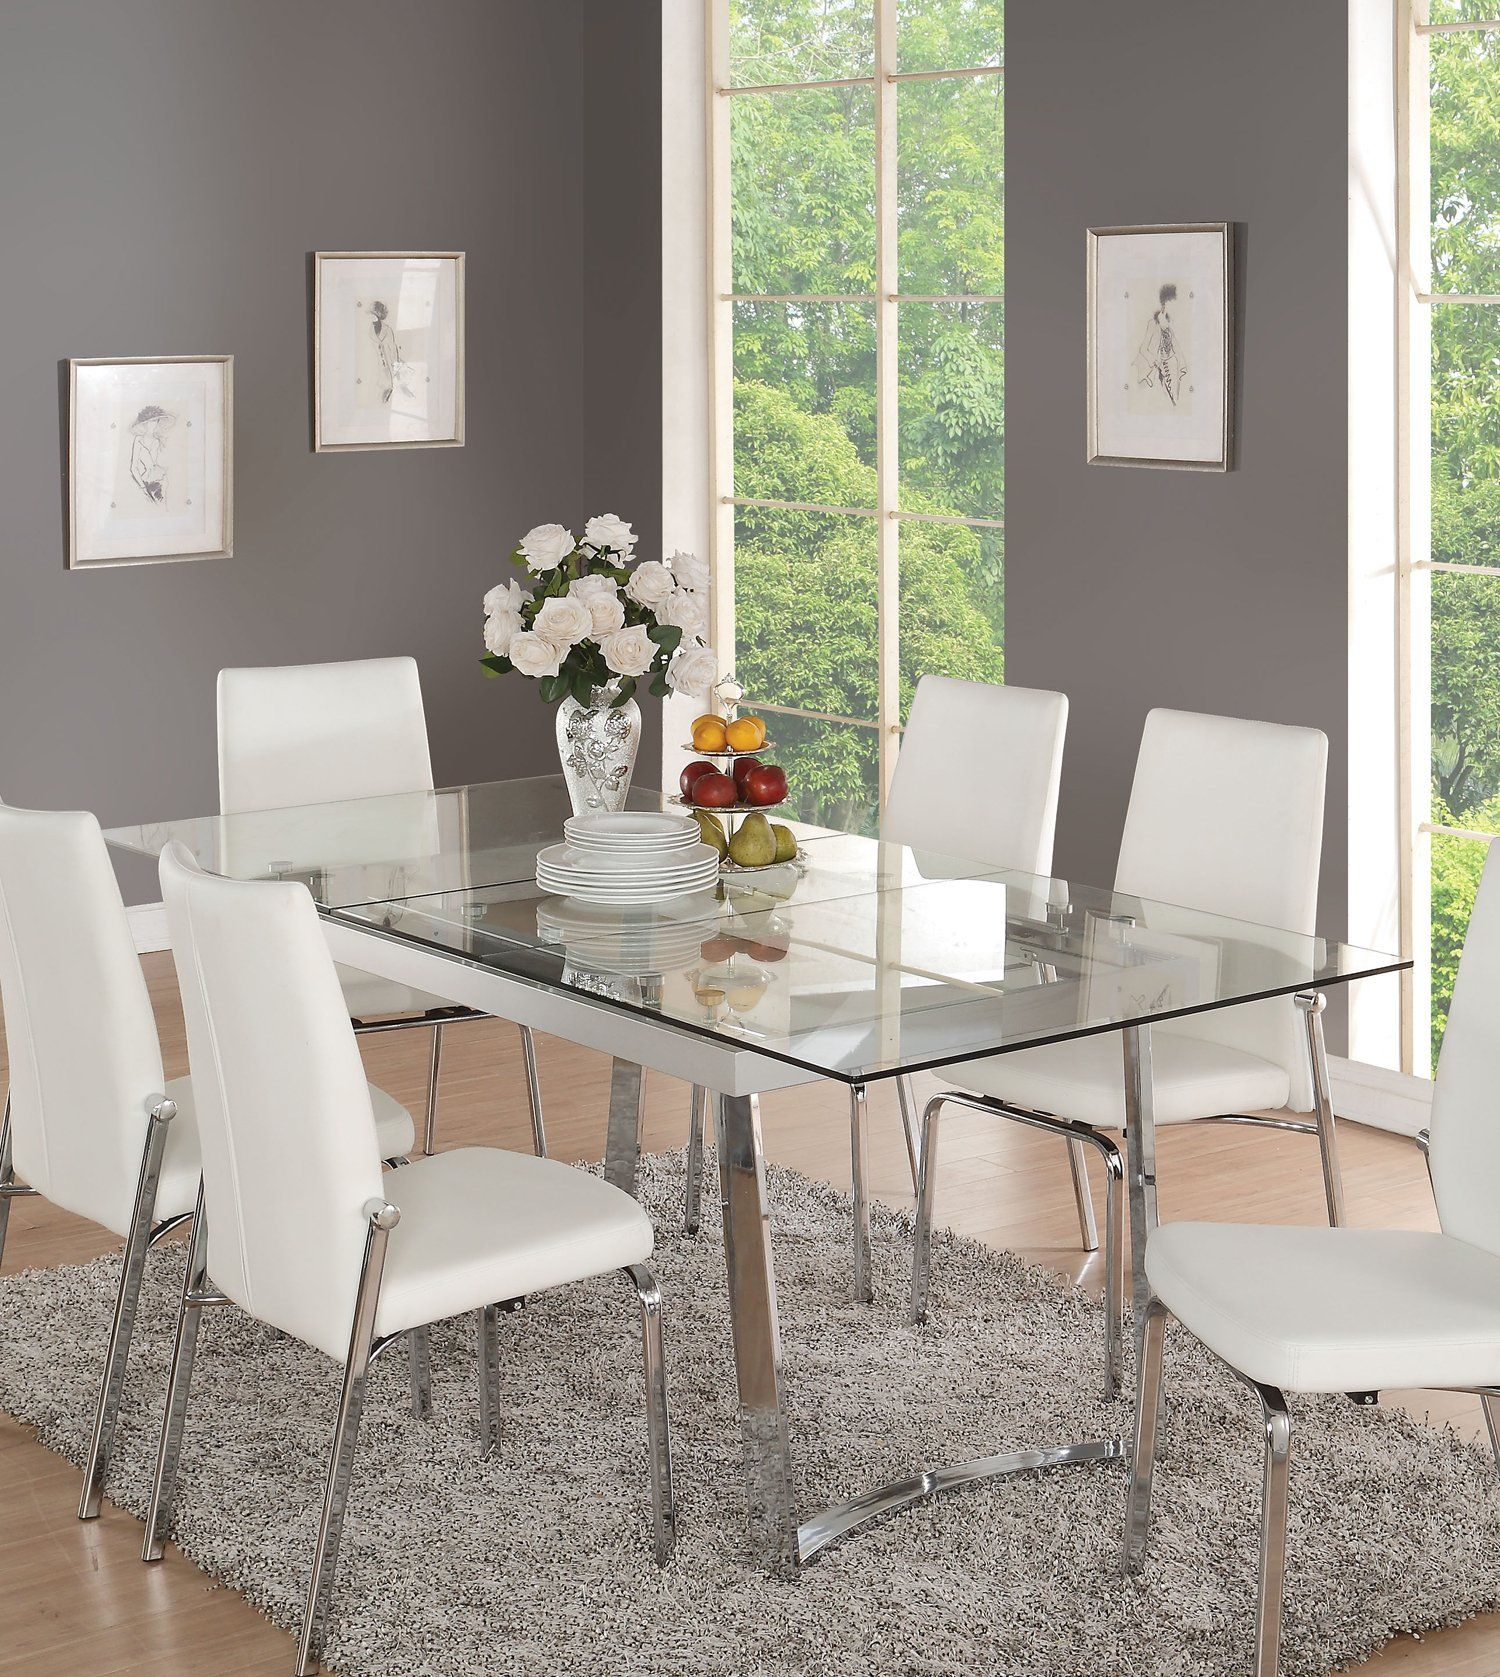 Acme 73150 Osias White Chrome Clear Glass Dining Table Modern Glass Dining Table White Glass Dining Table Glass Dining Table